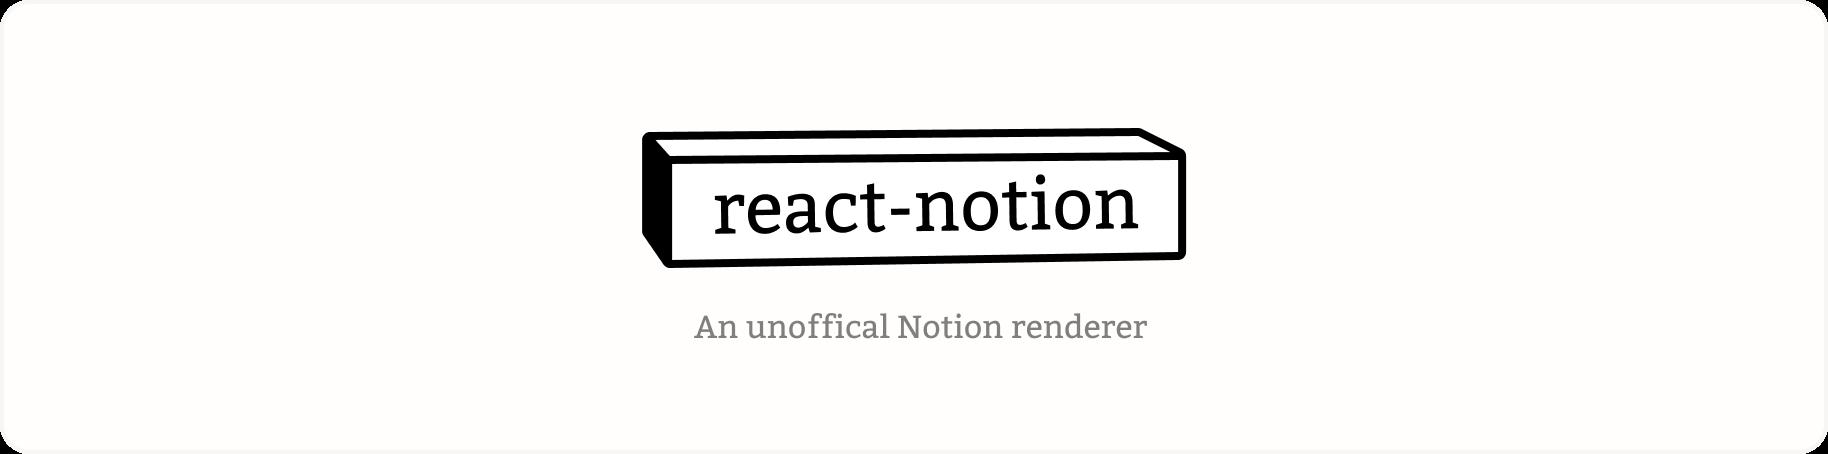 react-notion